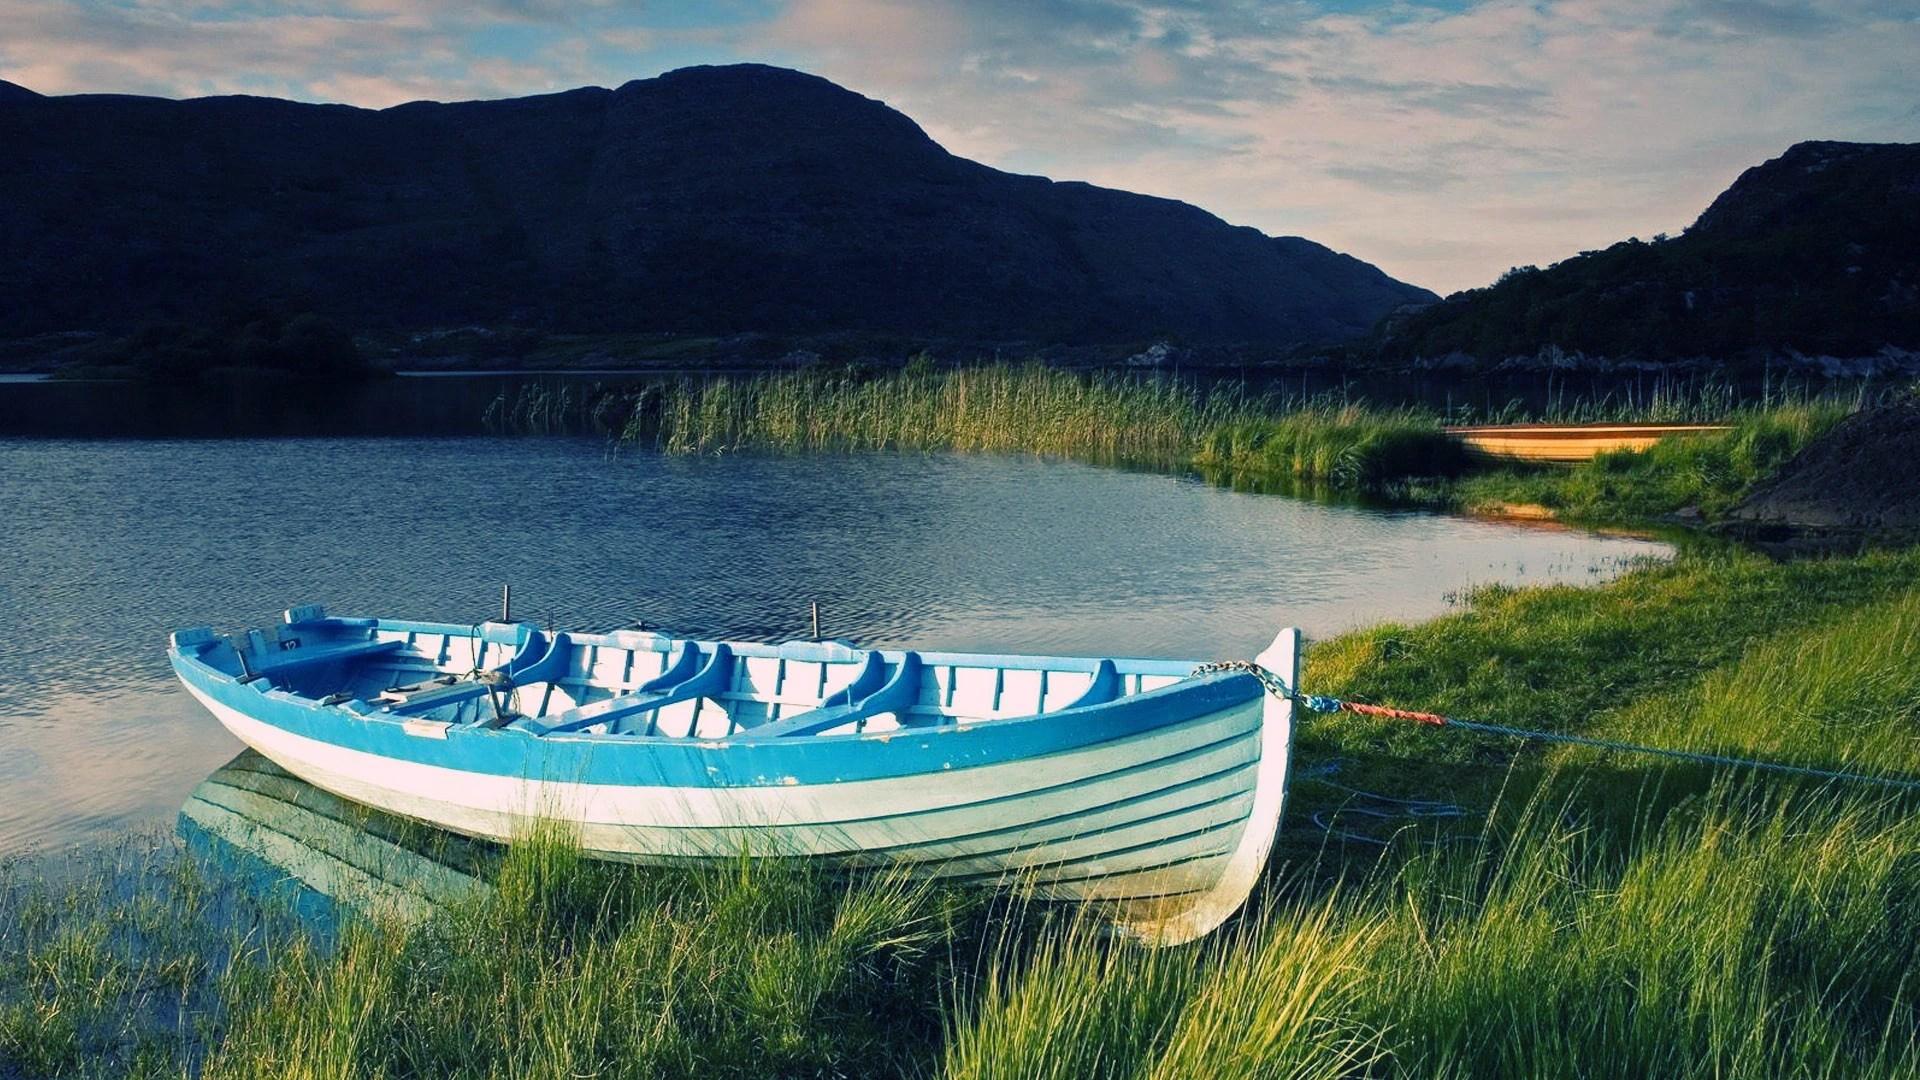 Boat Lake Wallpaper